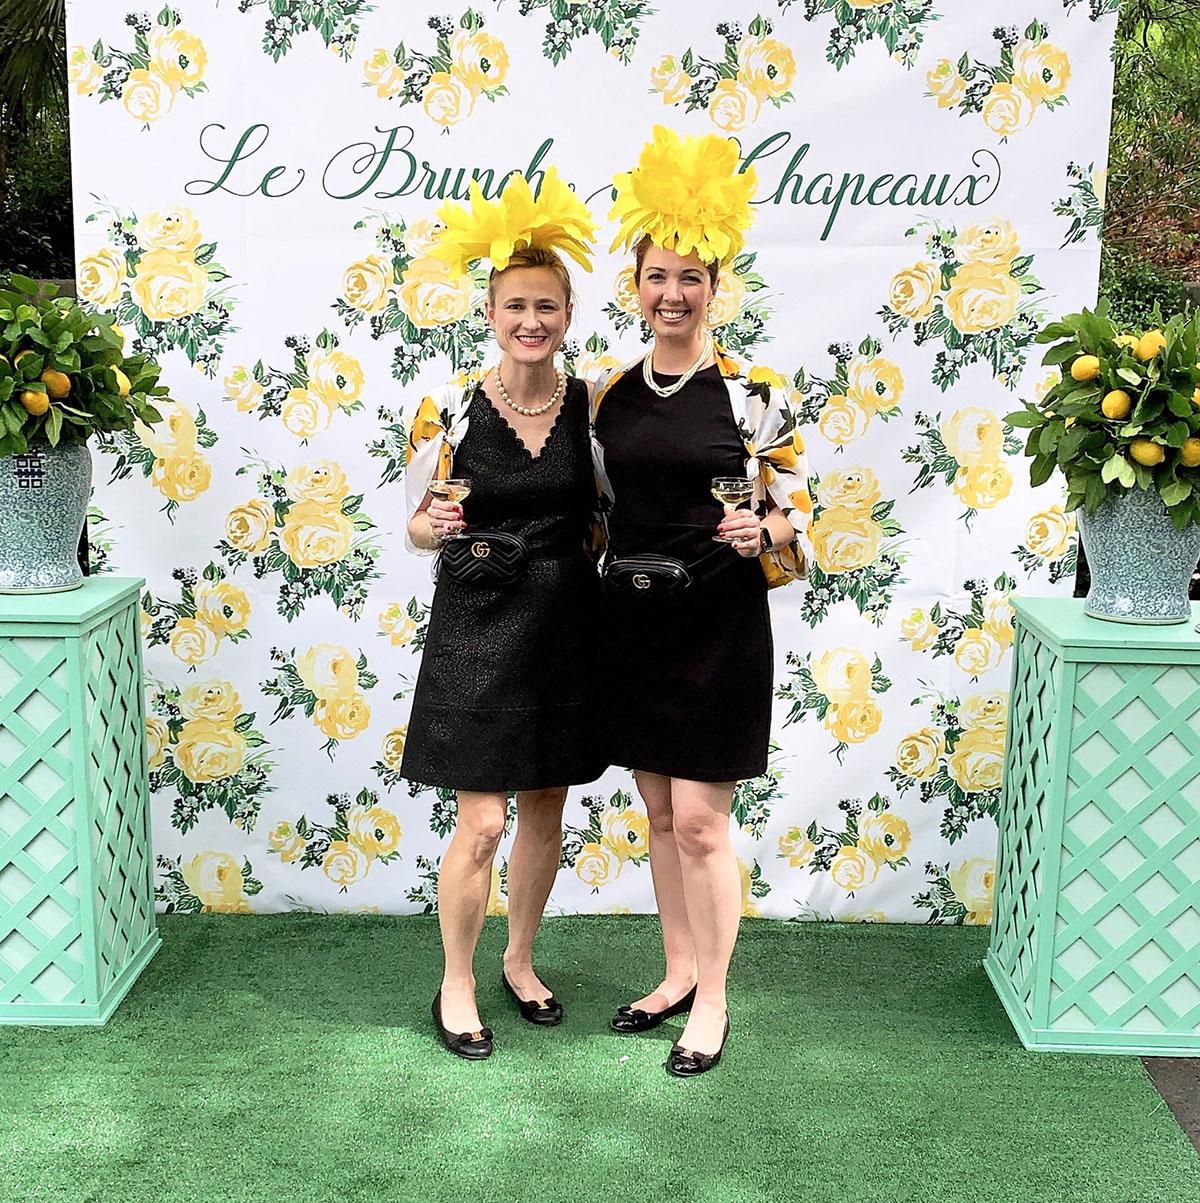 Laura Nell Burton and Christin Gish